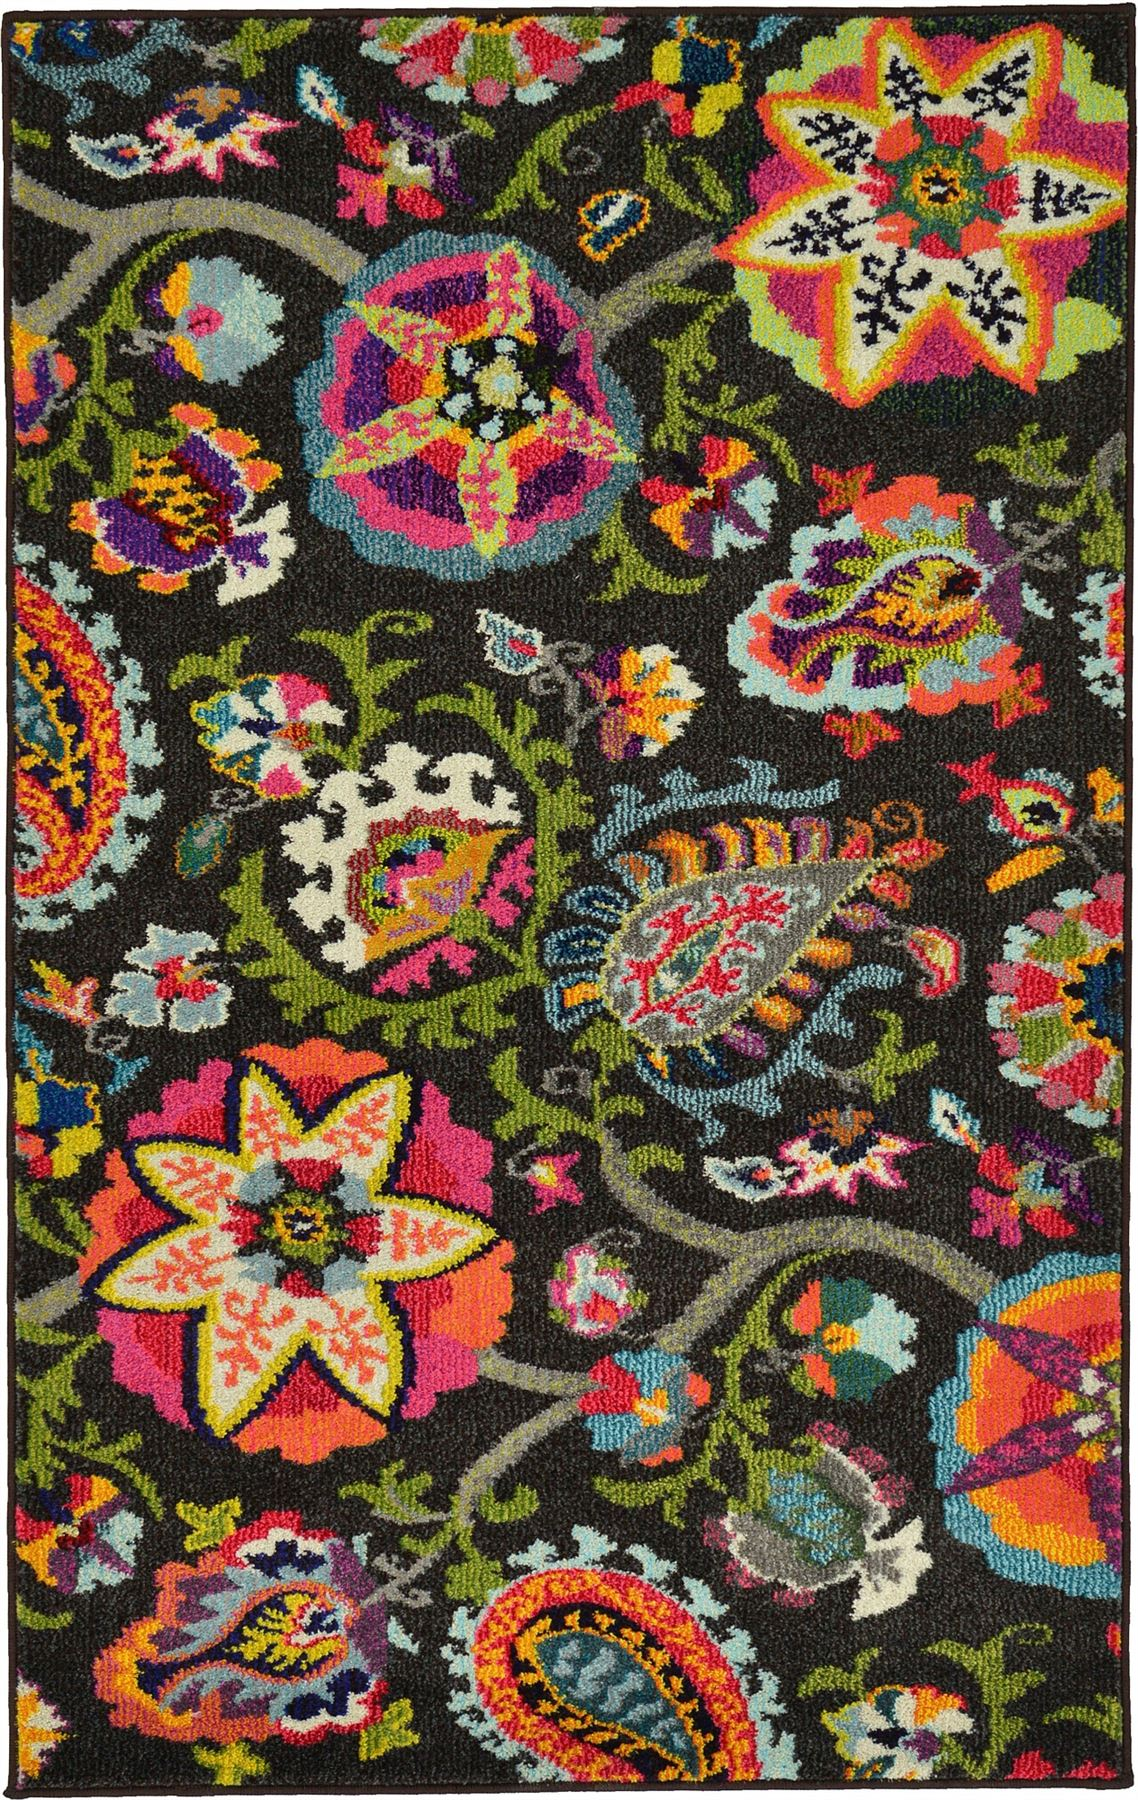 fringeless floral style carpets kids modern rugs area rug floor  - fringelessfloralstylecarpetskidsmodernrugsarea